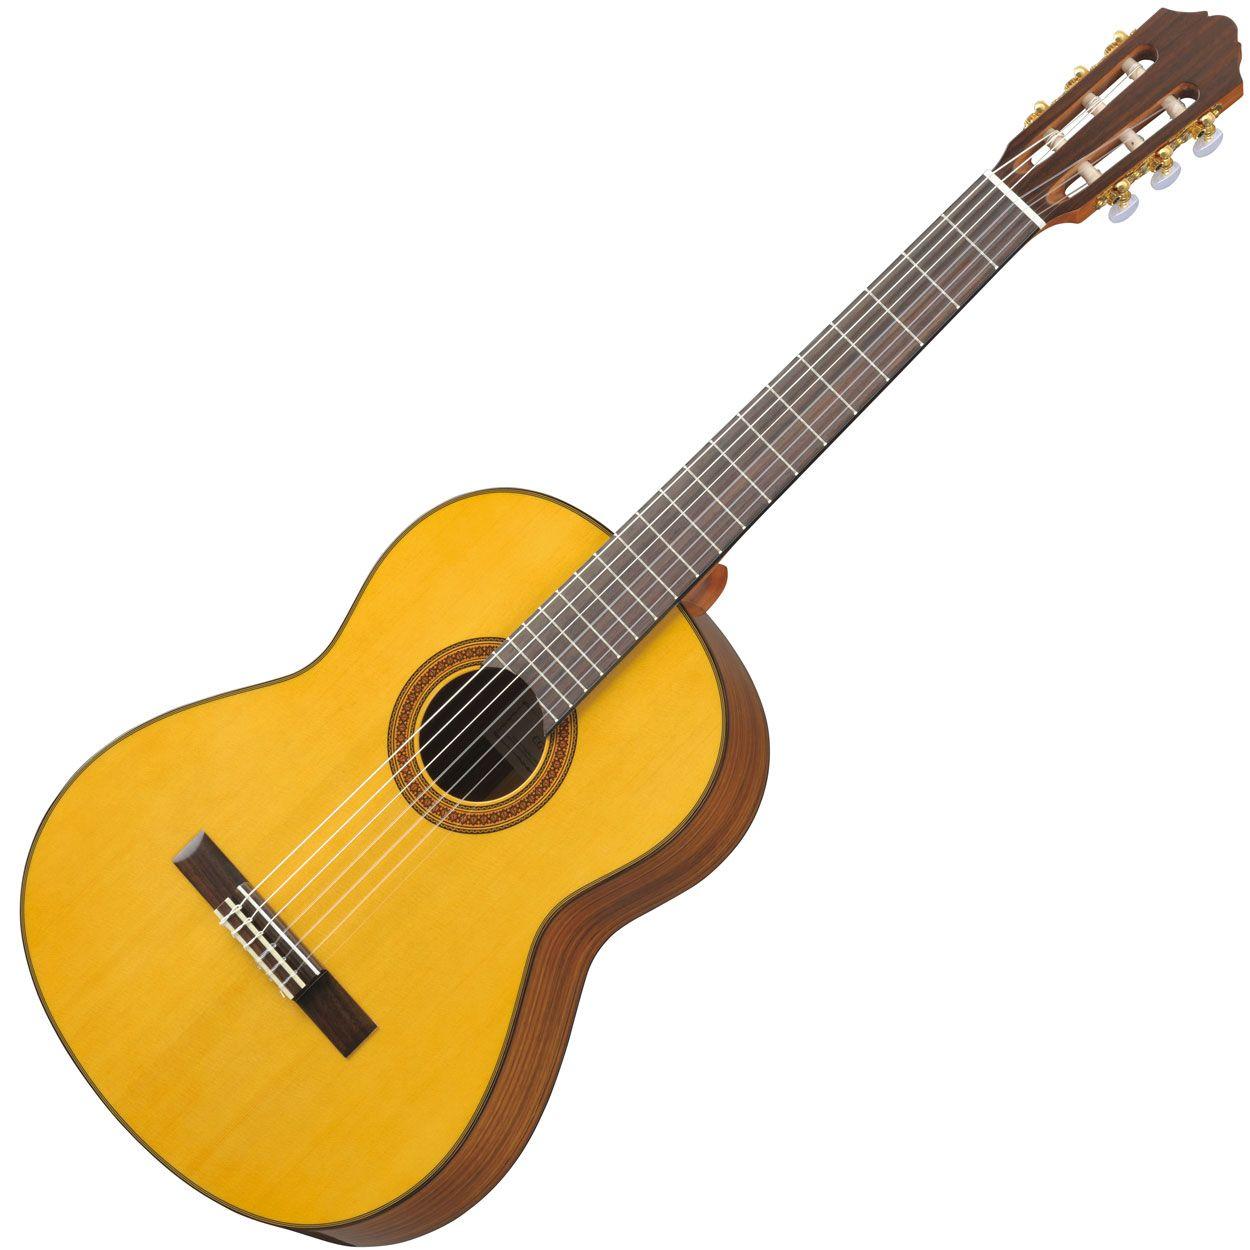 tatra classic my first guitar classical guitar classical acoustic guitar guitar. Black Bedroom Furniture Sets. Home Design Ideas